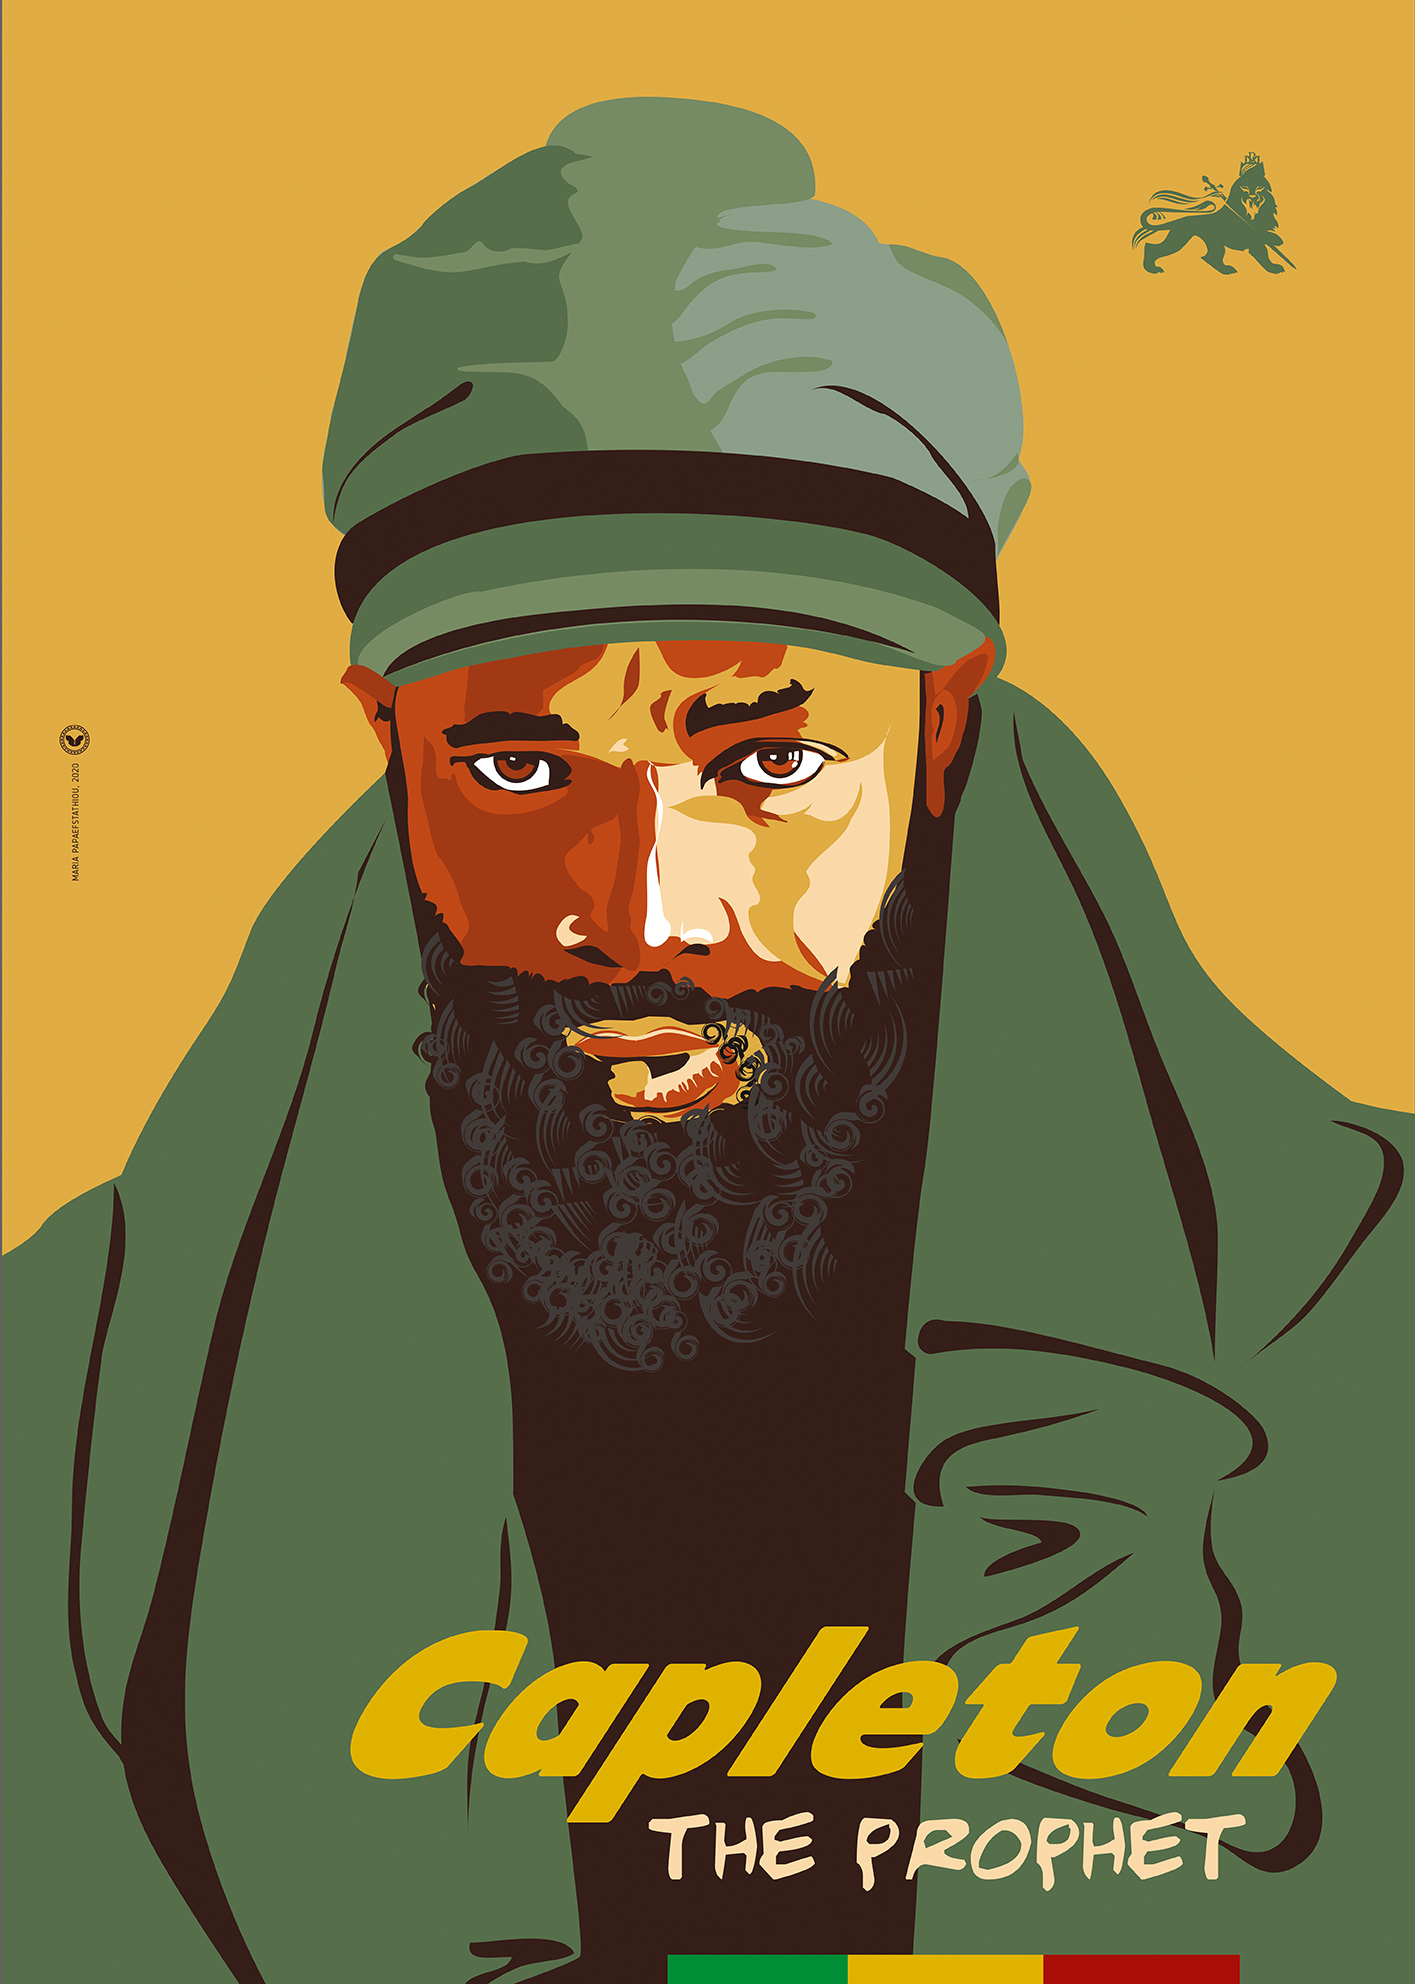 Capleton - The prophet